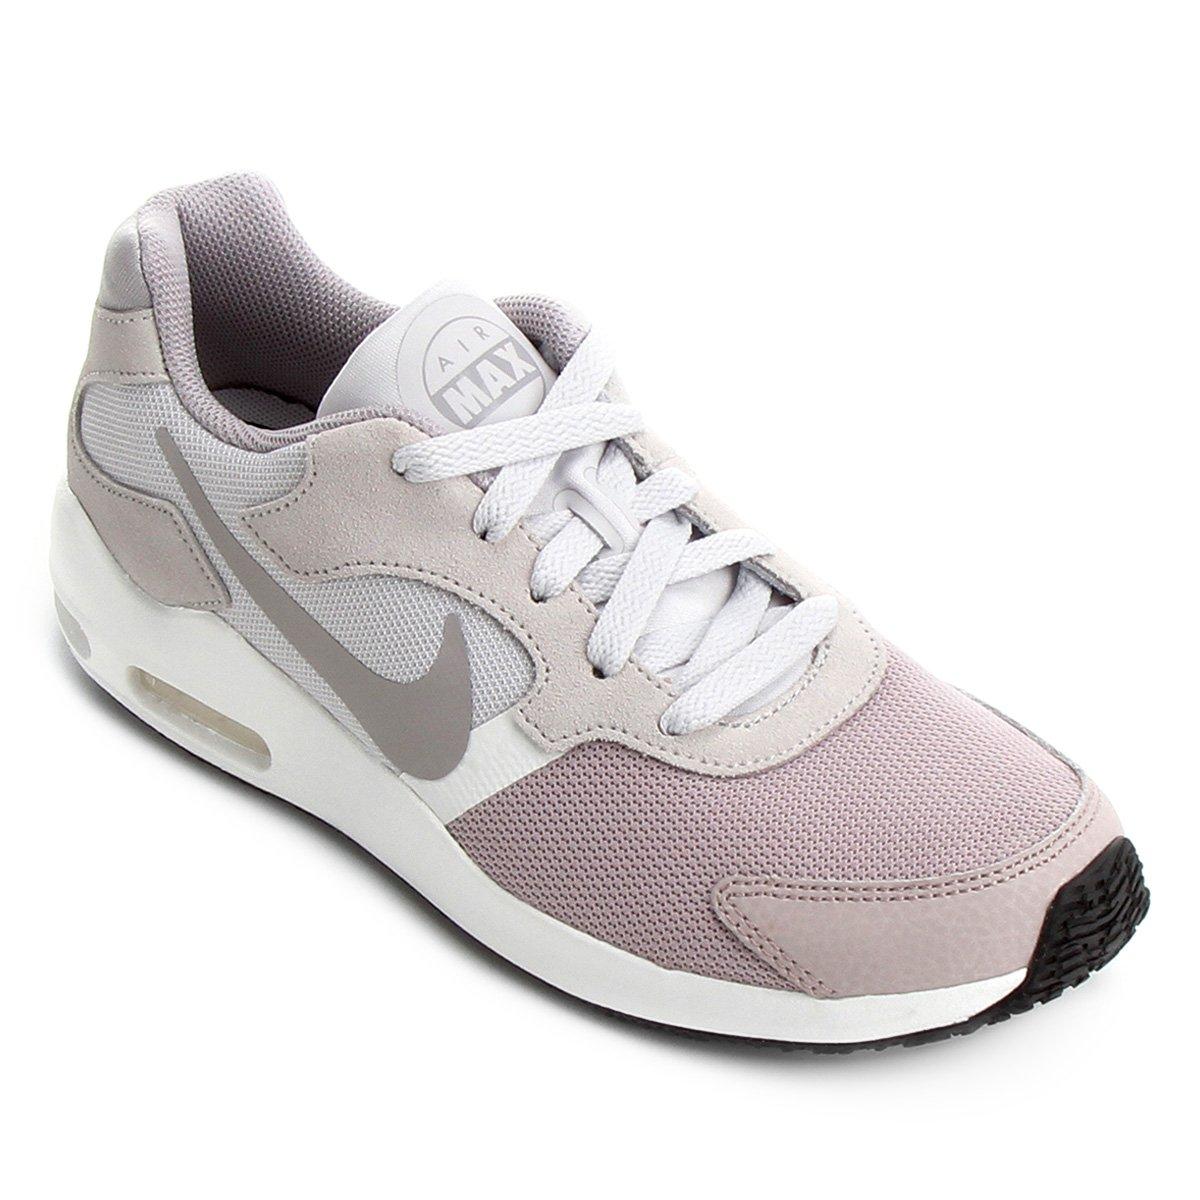 20cff054b1 Tênis Nike Wmns Air Max Guile Feminino